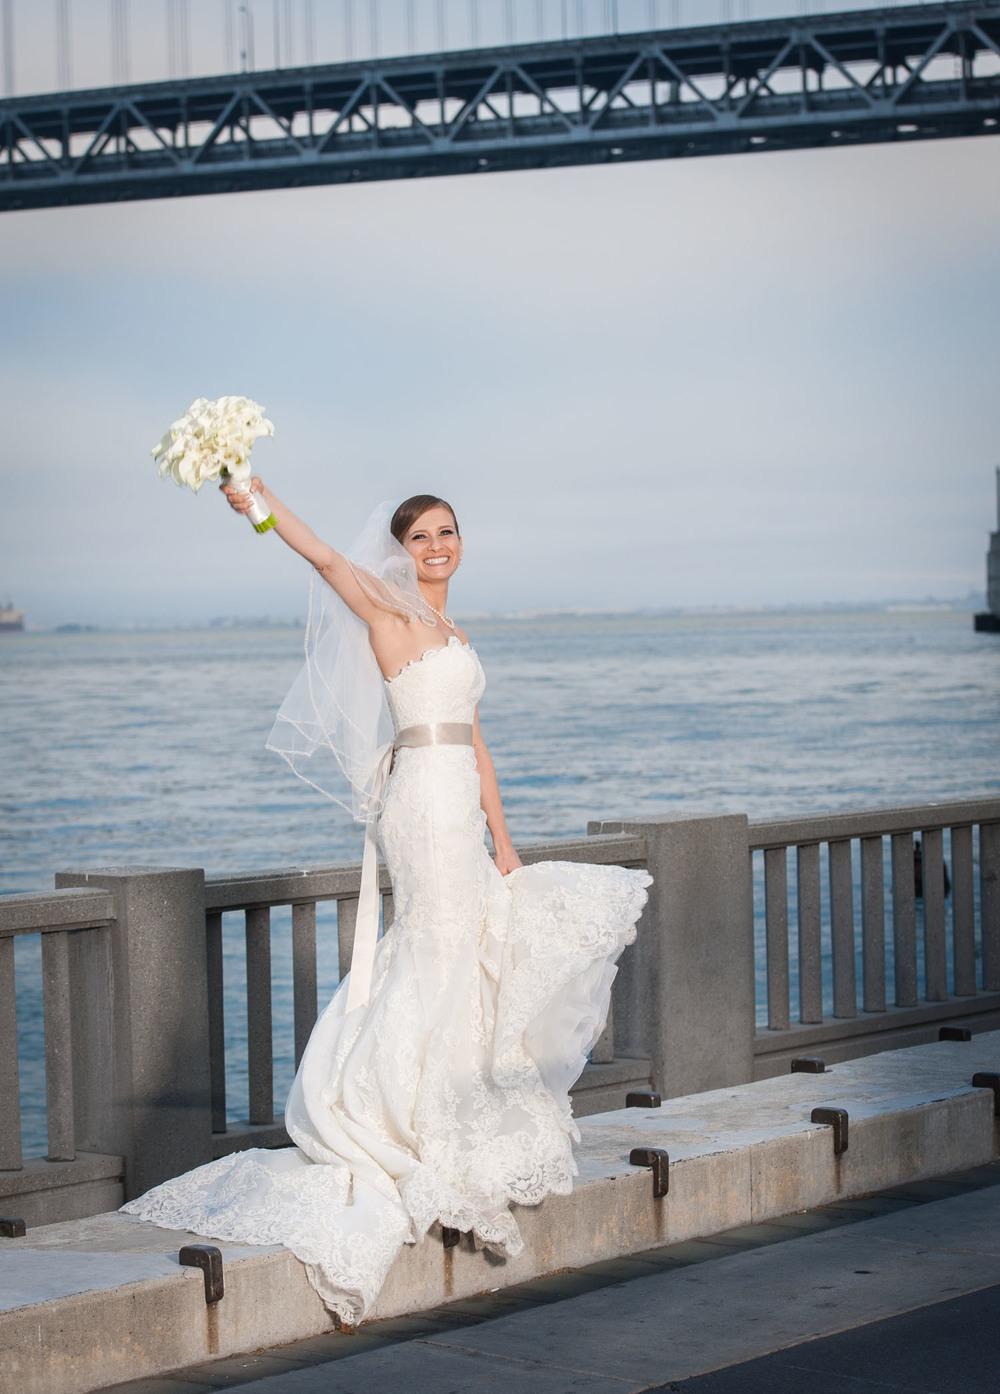 stewart_bertrand_wedding_photography_sp-1055.jpg